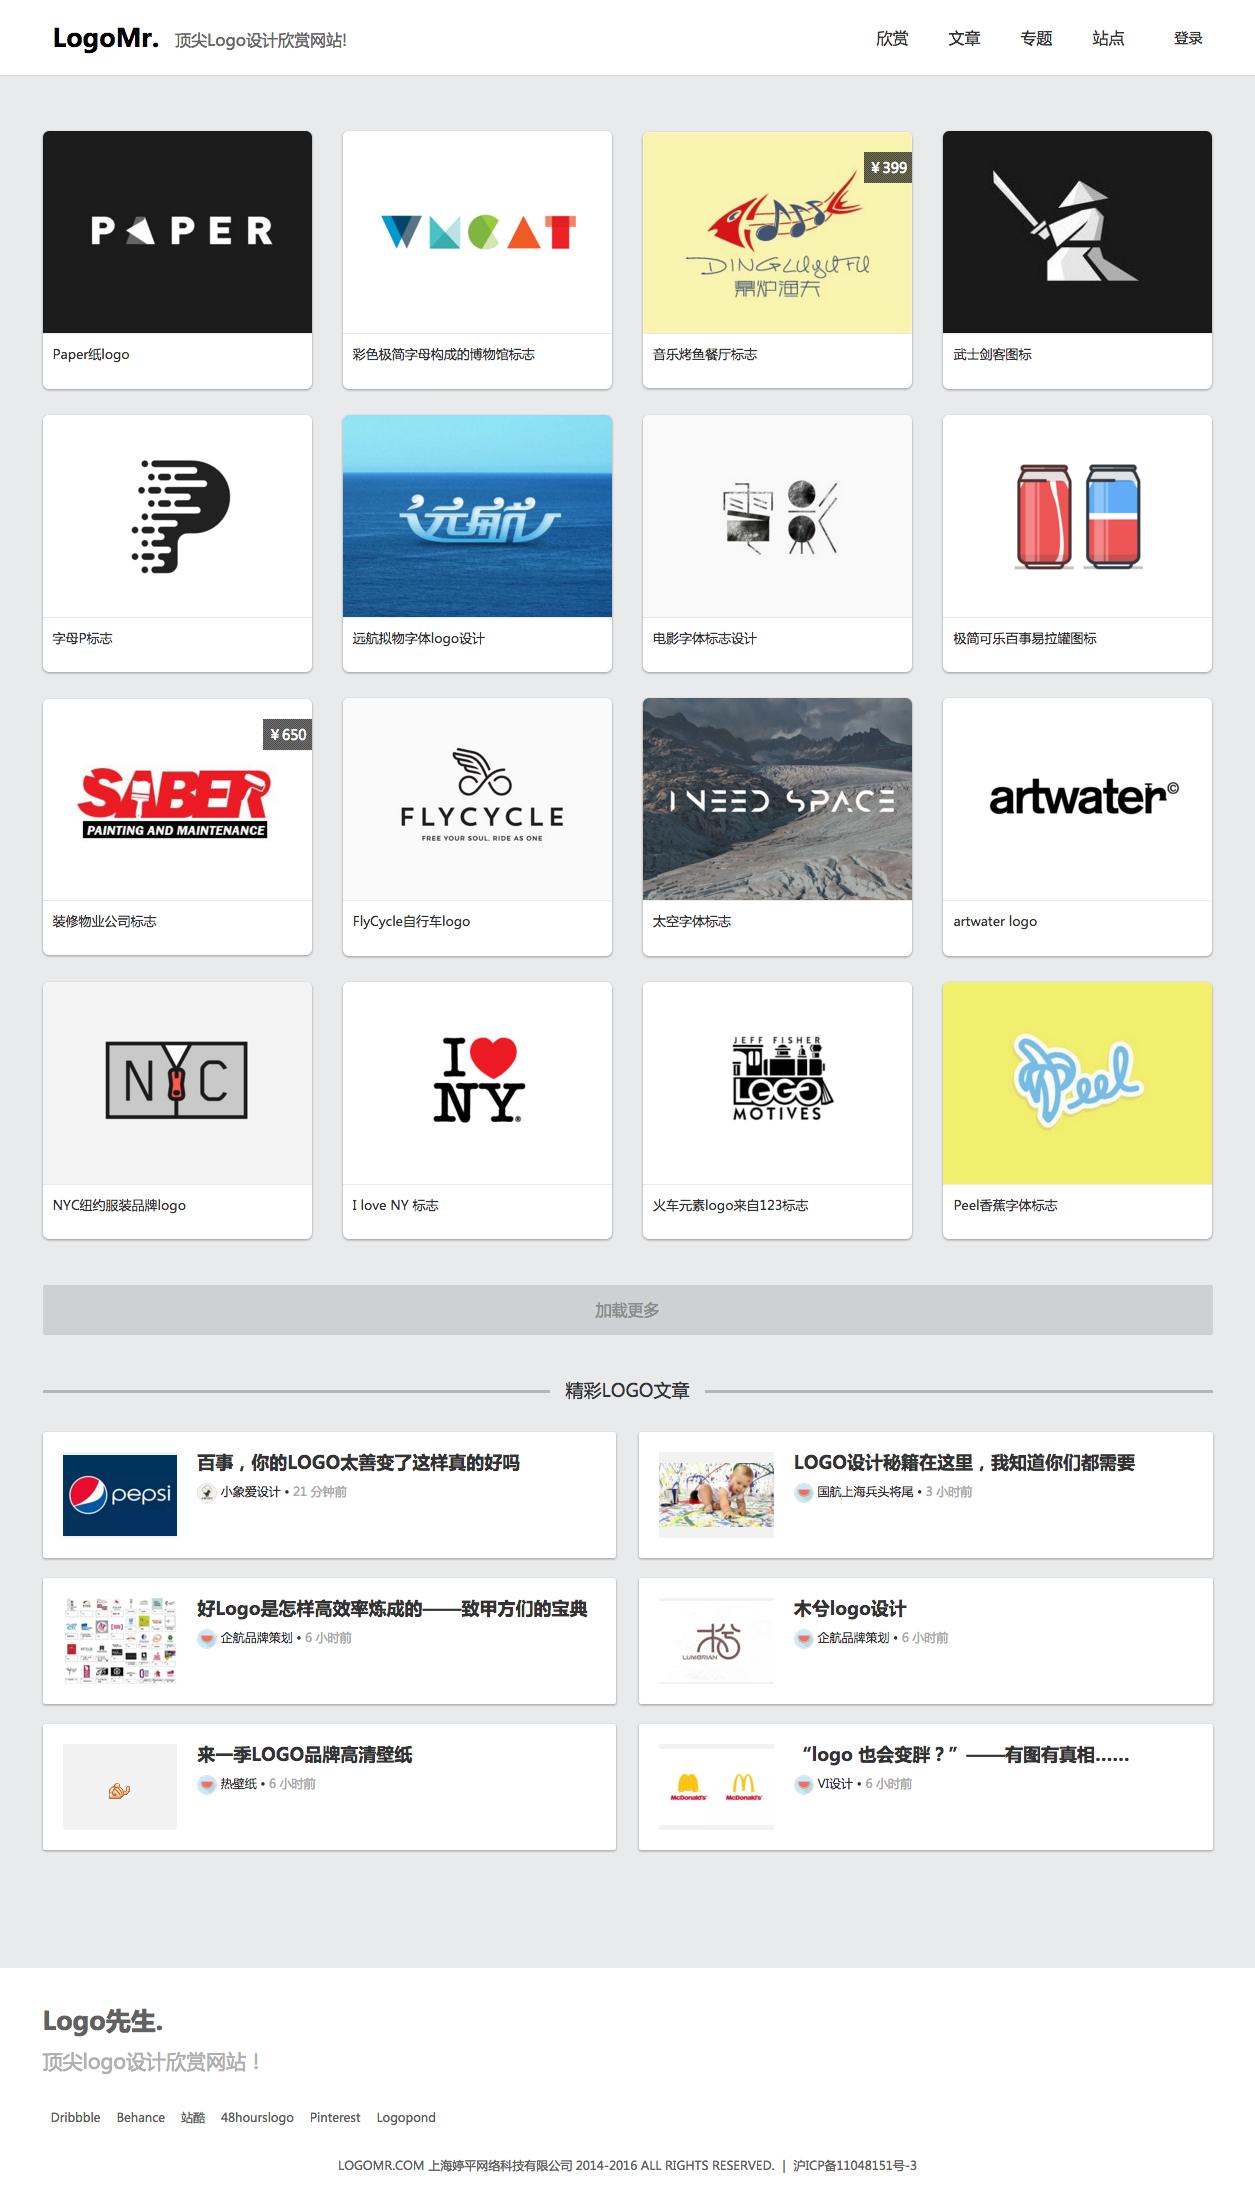 Logo先生,顶尖的logo设计欣赏网站!1